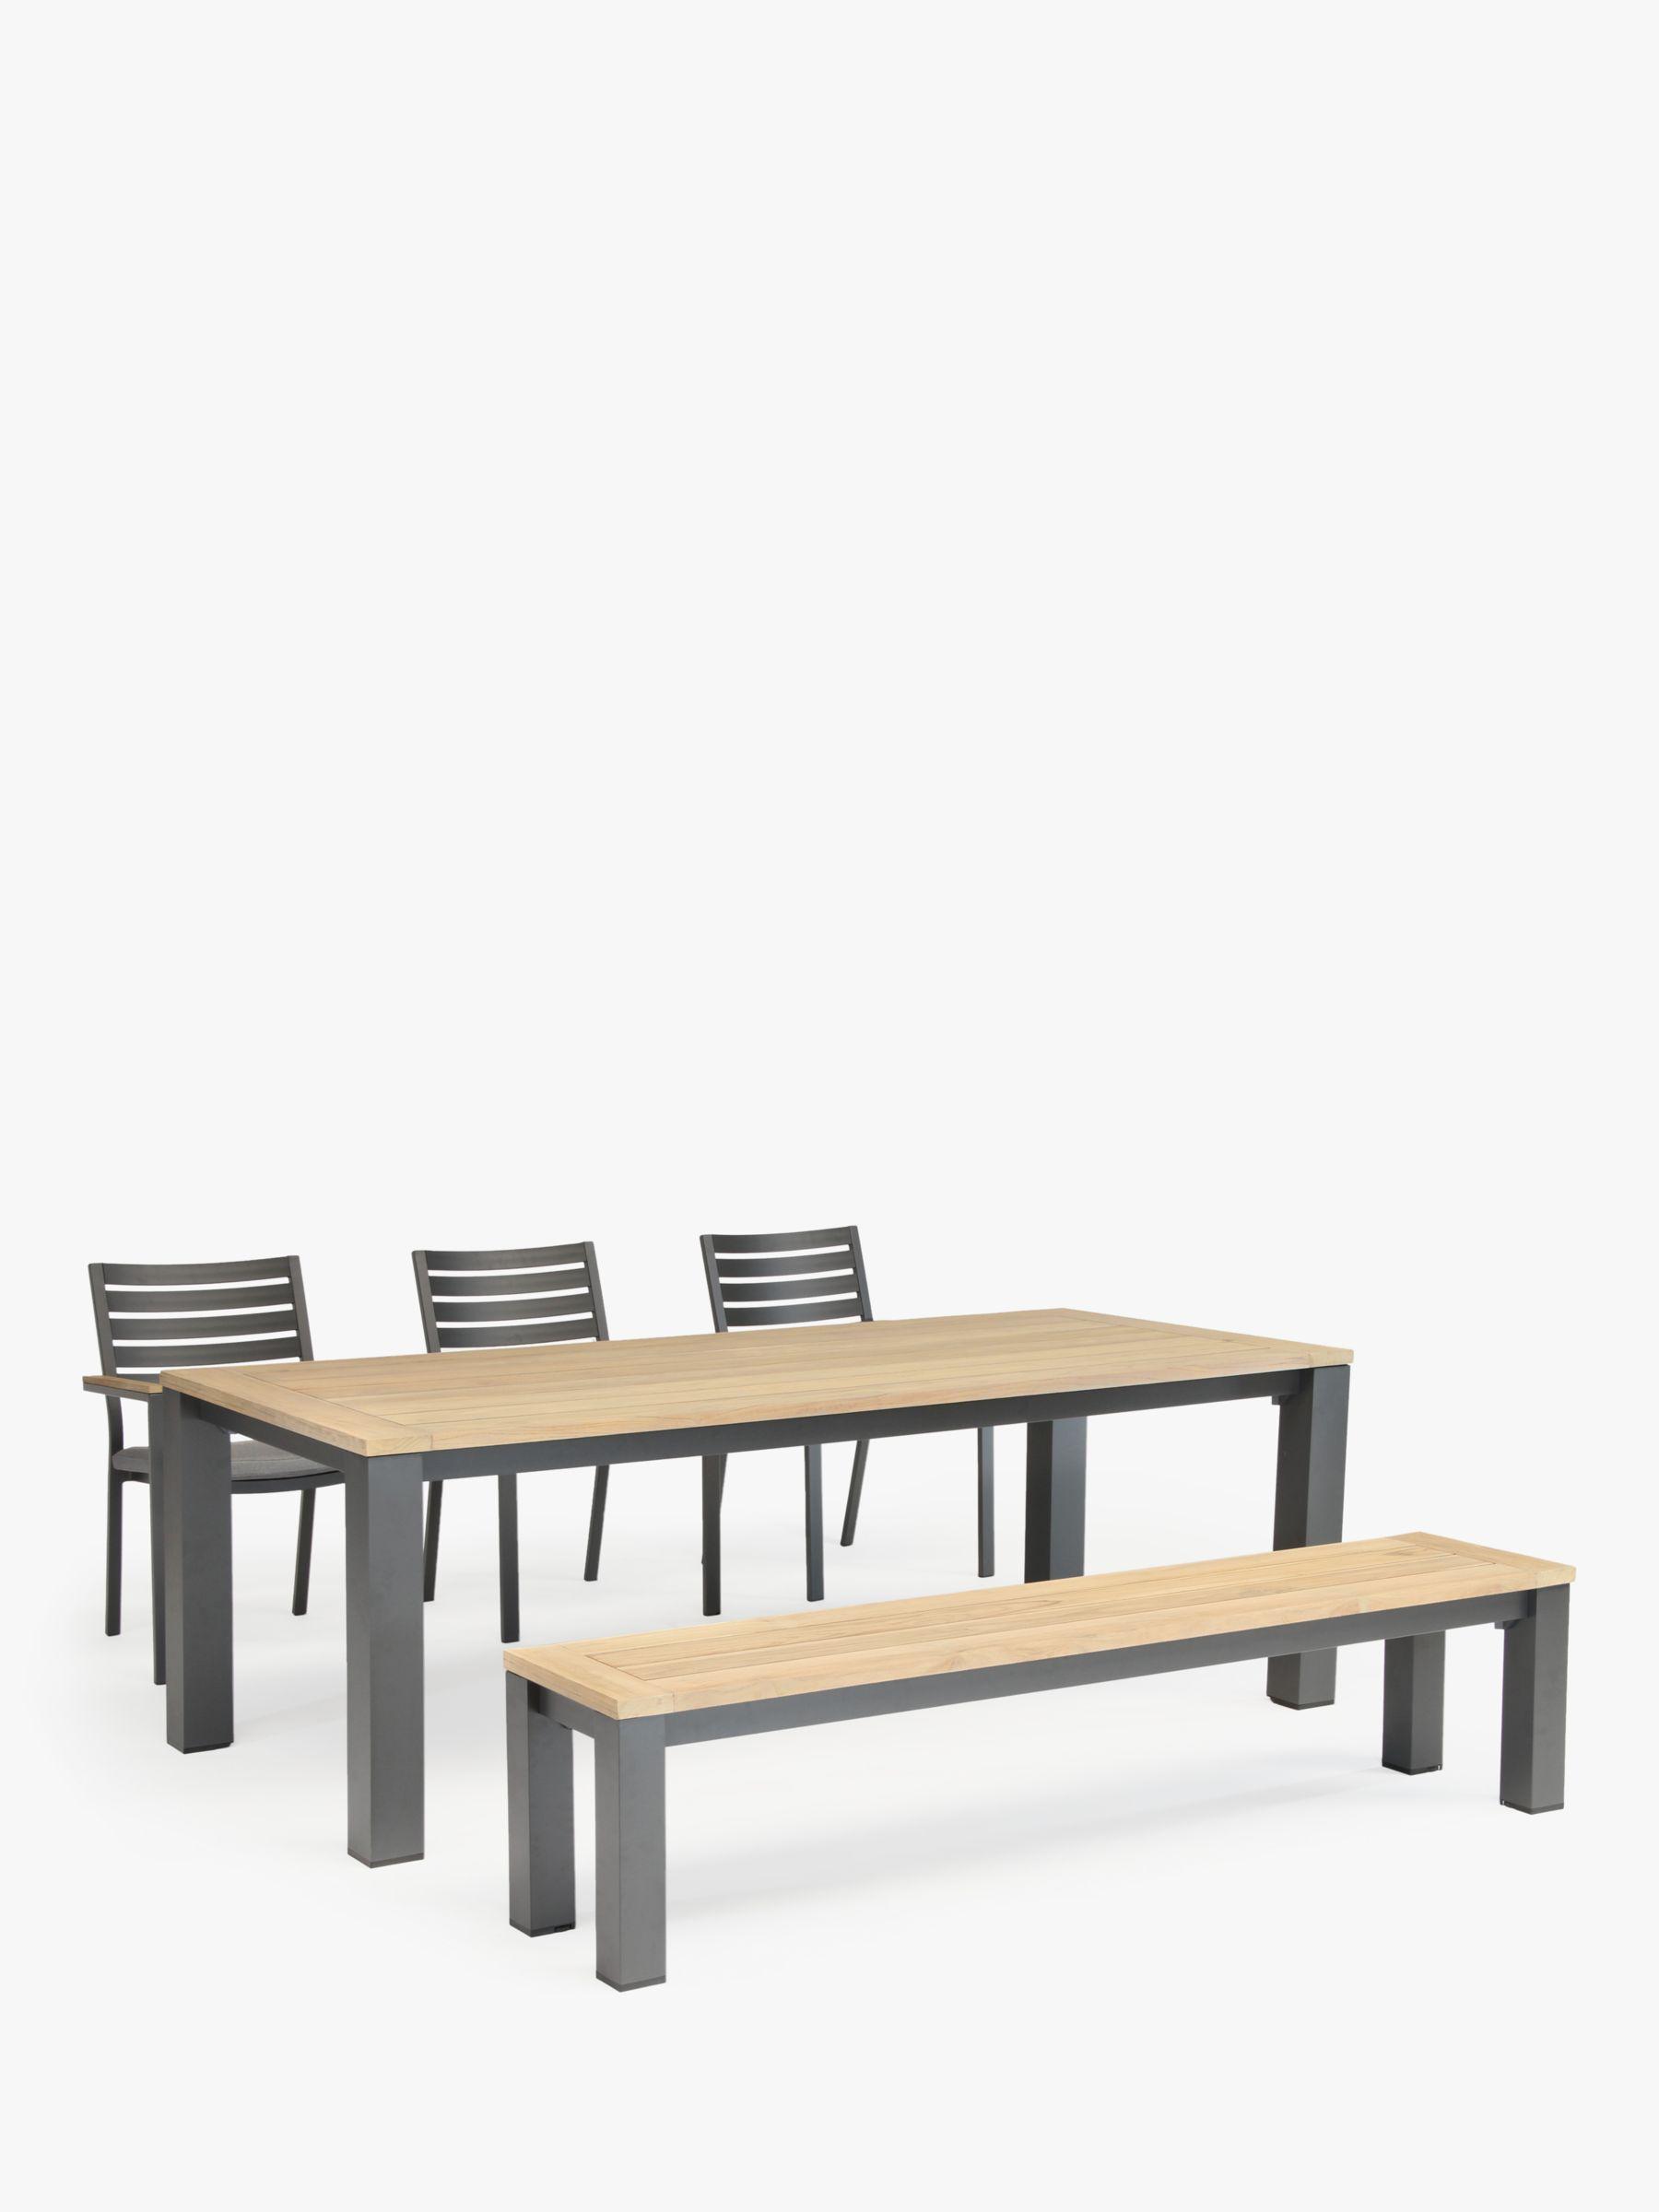 Picture of: Kettler Elba Garden Dining Bench Fsc Certified Teak Wood 200cm At John Lewis Partners